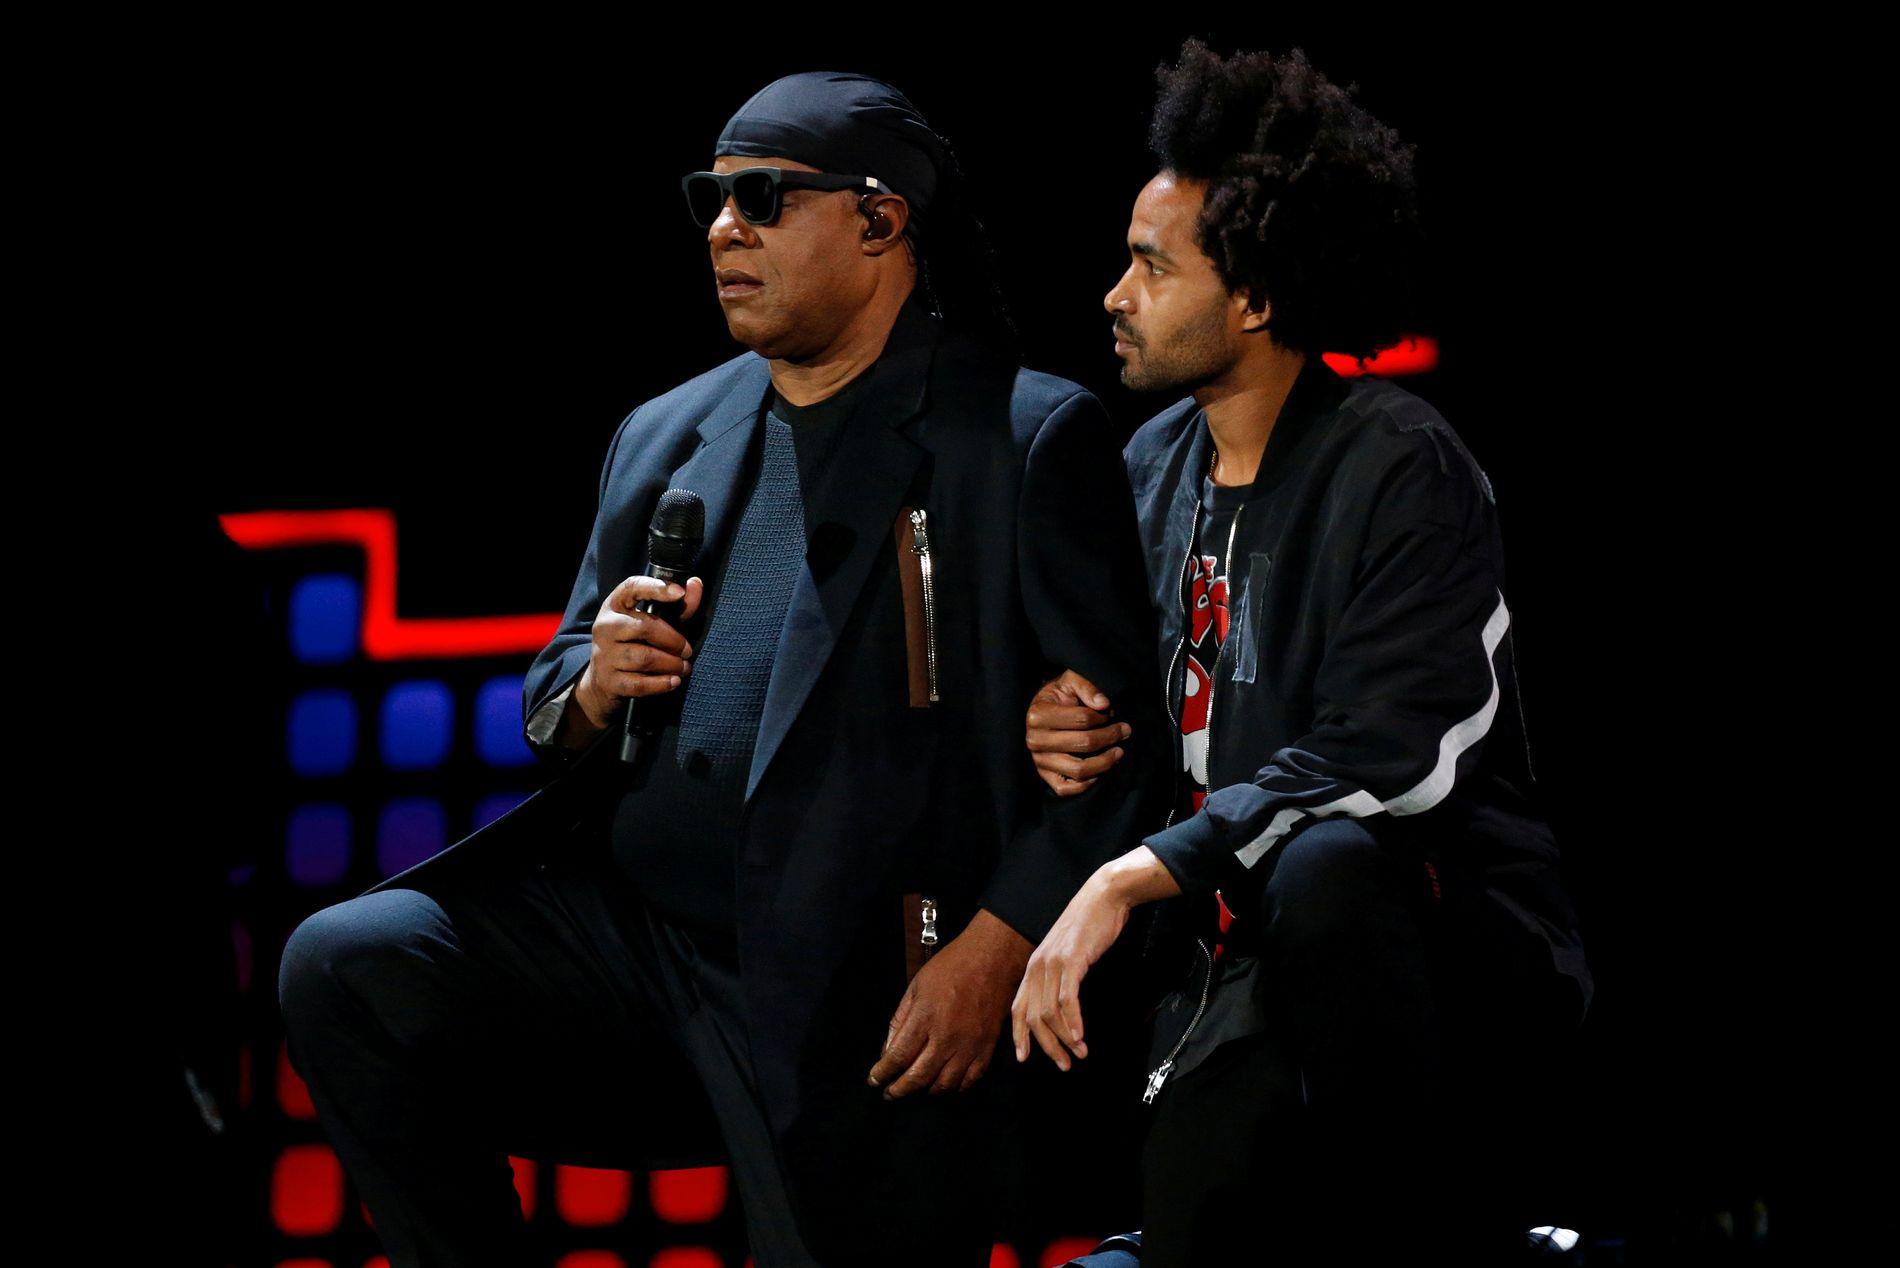 KNELTE: Stevie Wonder og sønnen Kwame kneler på Global Citizens Festival i Central Park lørdag.